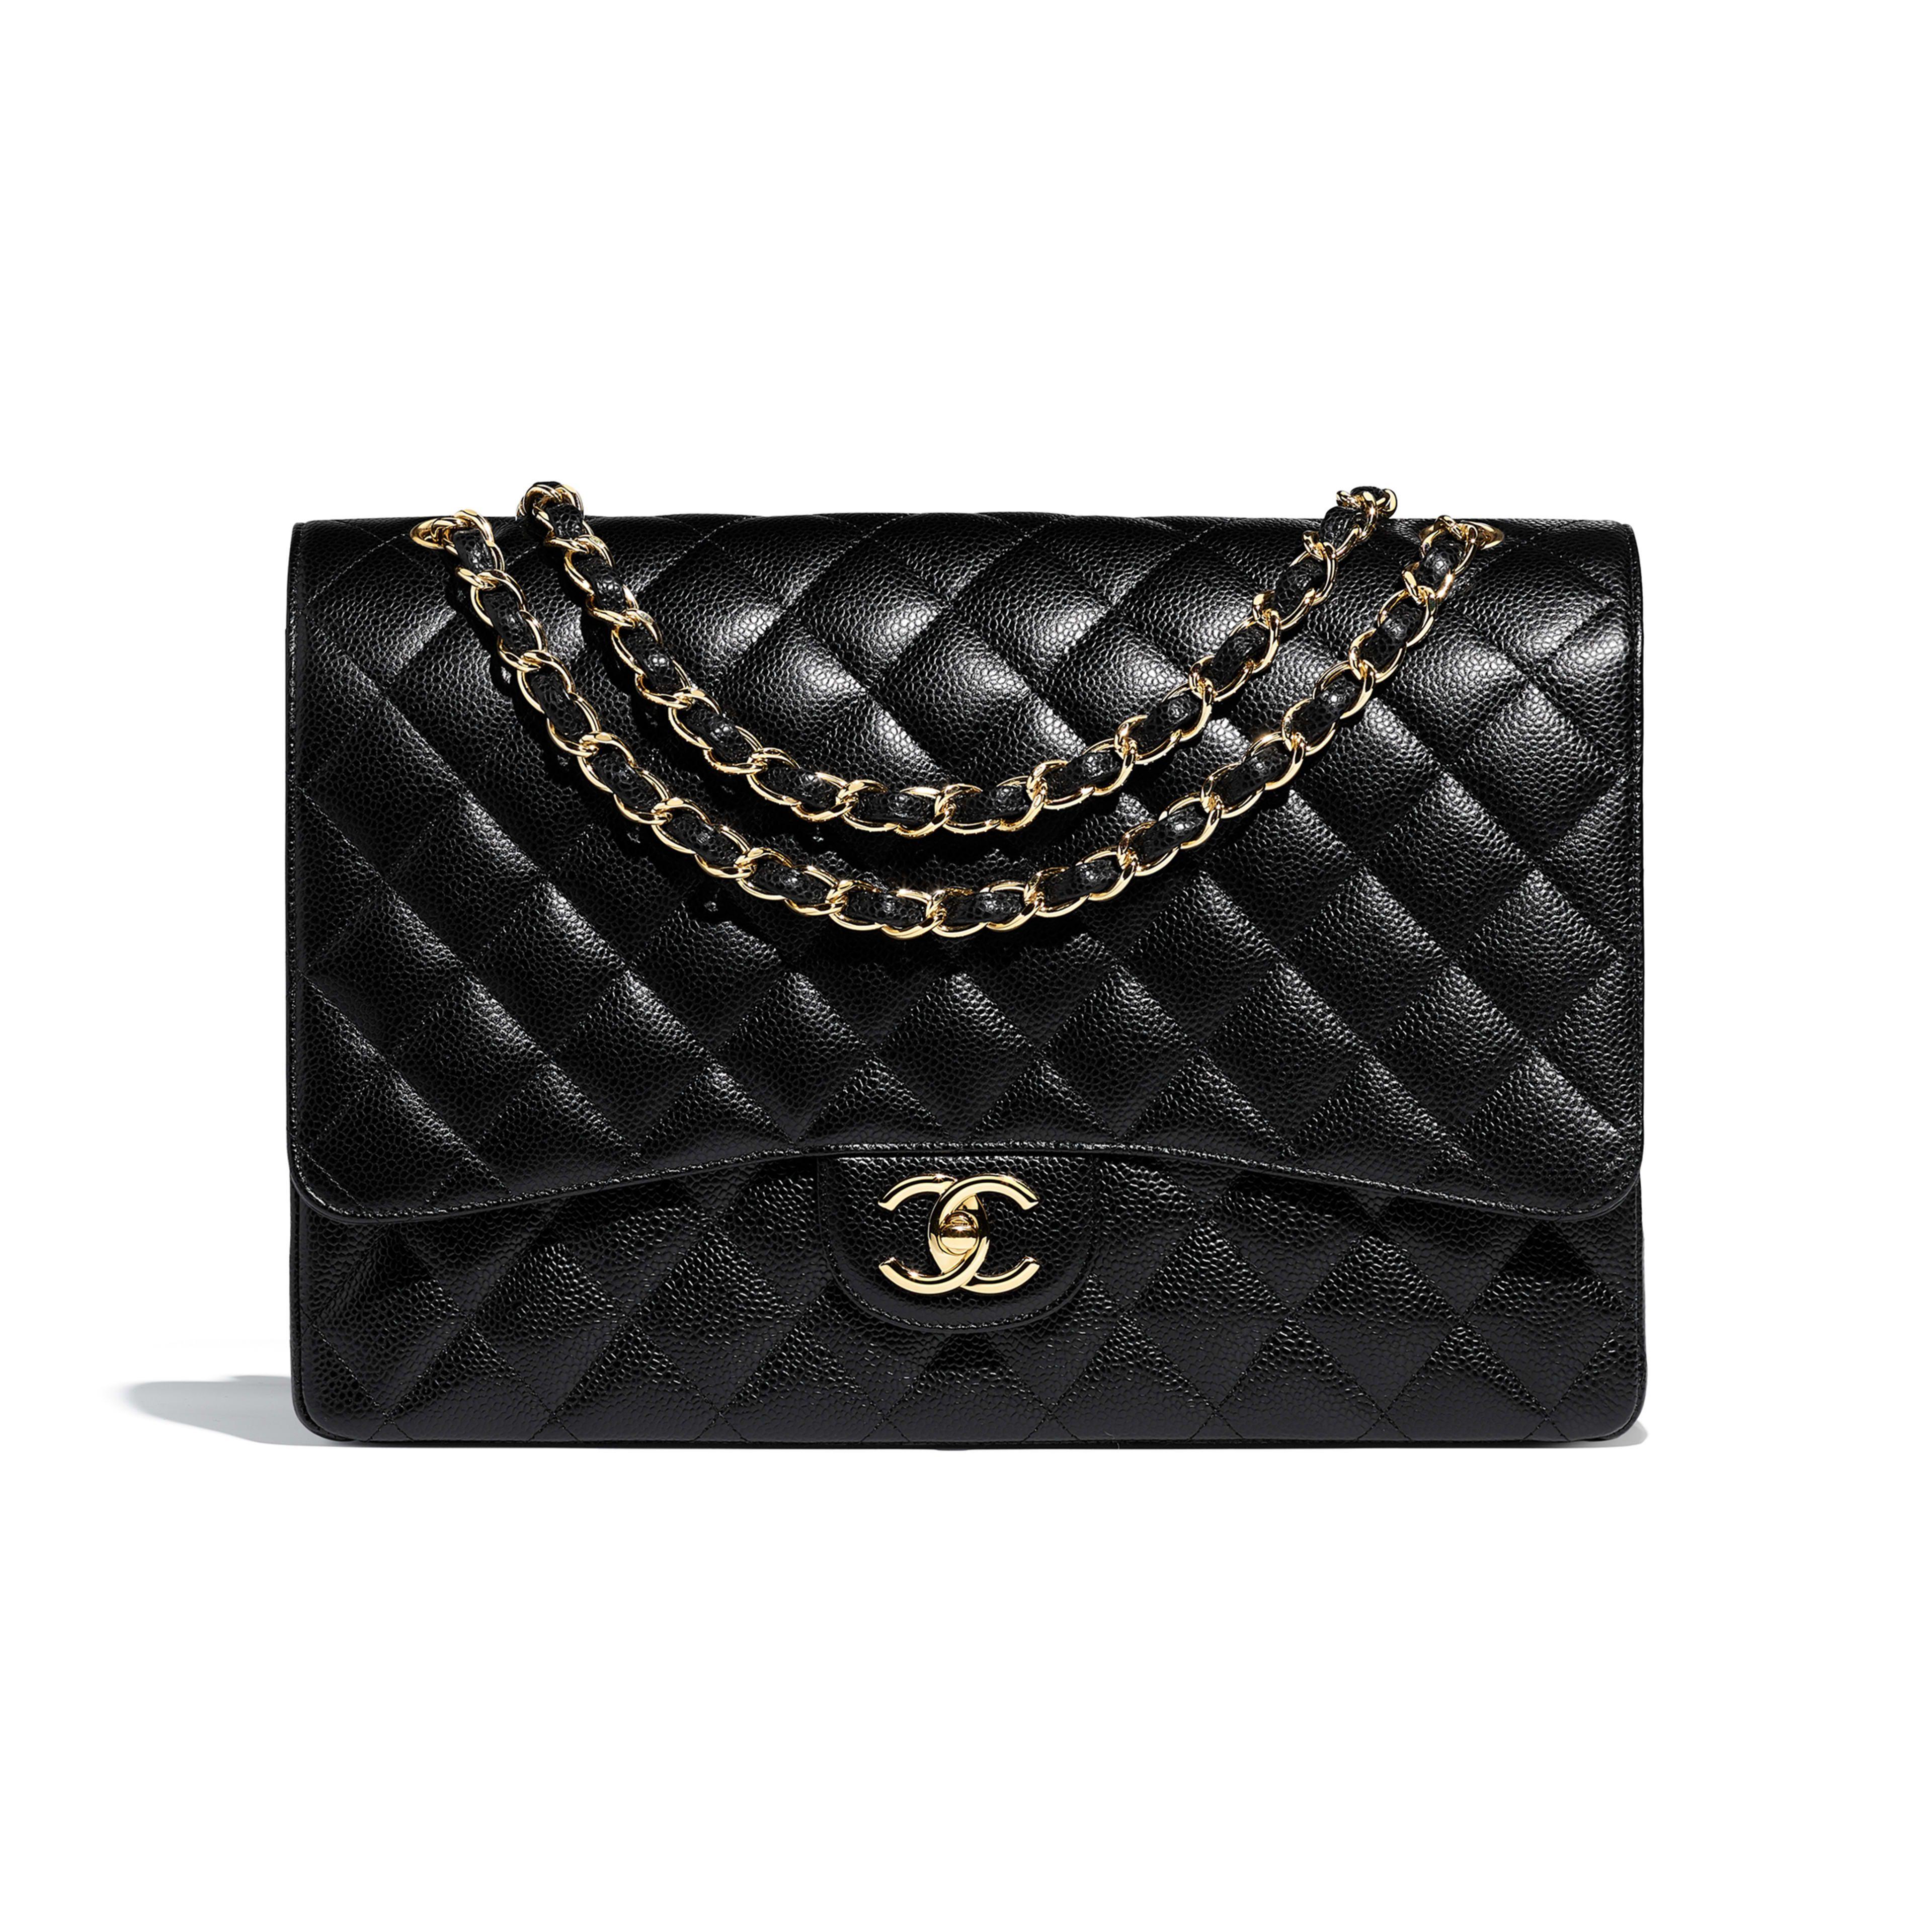 740fd9a5d1 Aged Calfskin   Gold-Tone Metal Black Large Shopping Bag